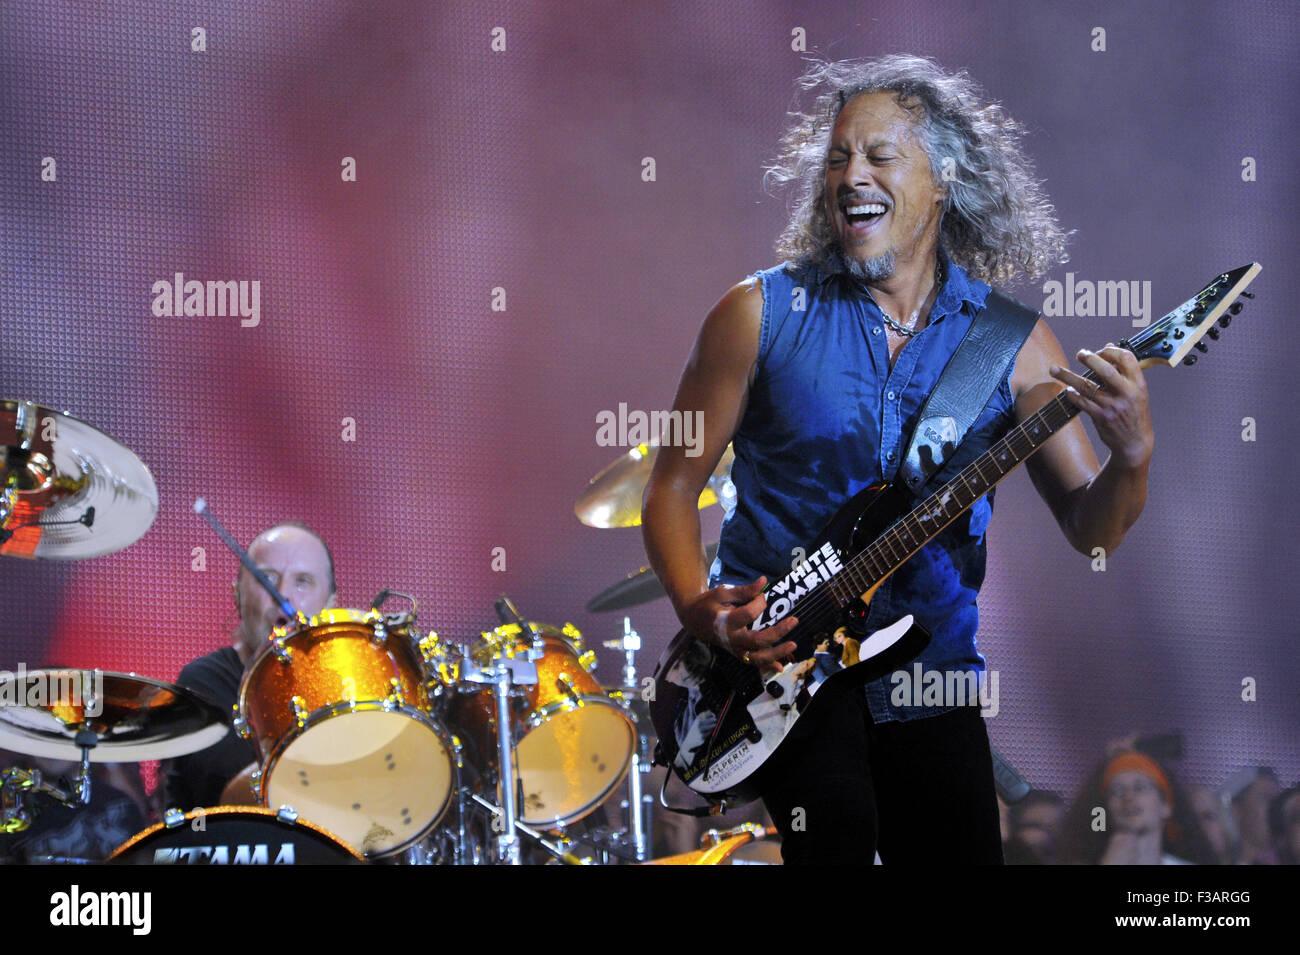 Lollapalooza Festival 2015 - Performances - Metallica  Featuring: Kirk Hammett, Metallica Where: Chicago, Illinois, - Stock Image